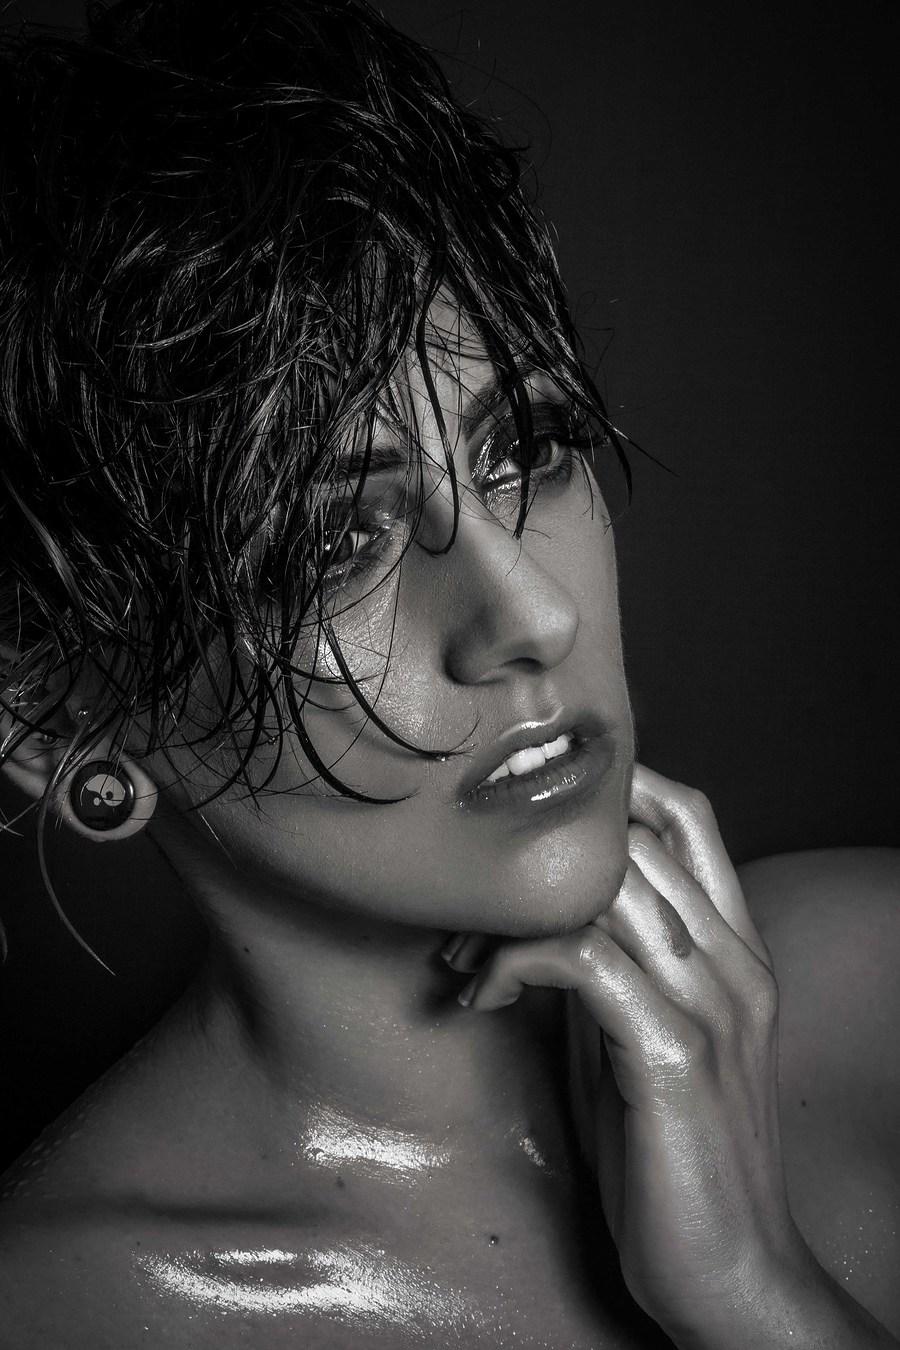 Photography by Iulia David, Model Sophia Andreou / Uploaded 21st November 2014 @ 07:44 PM